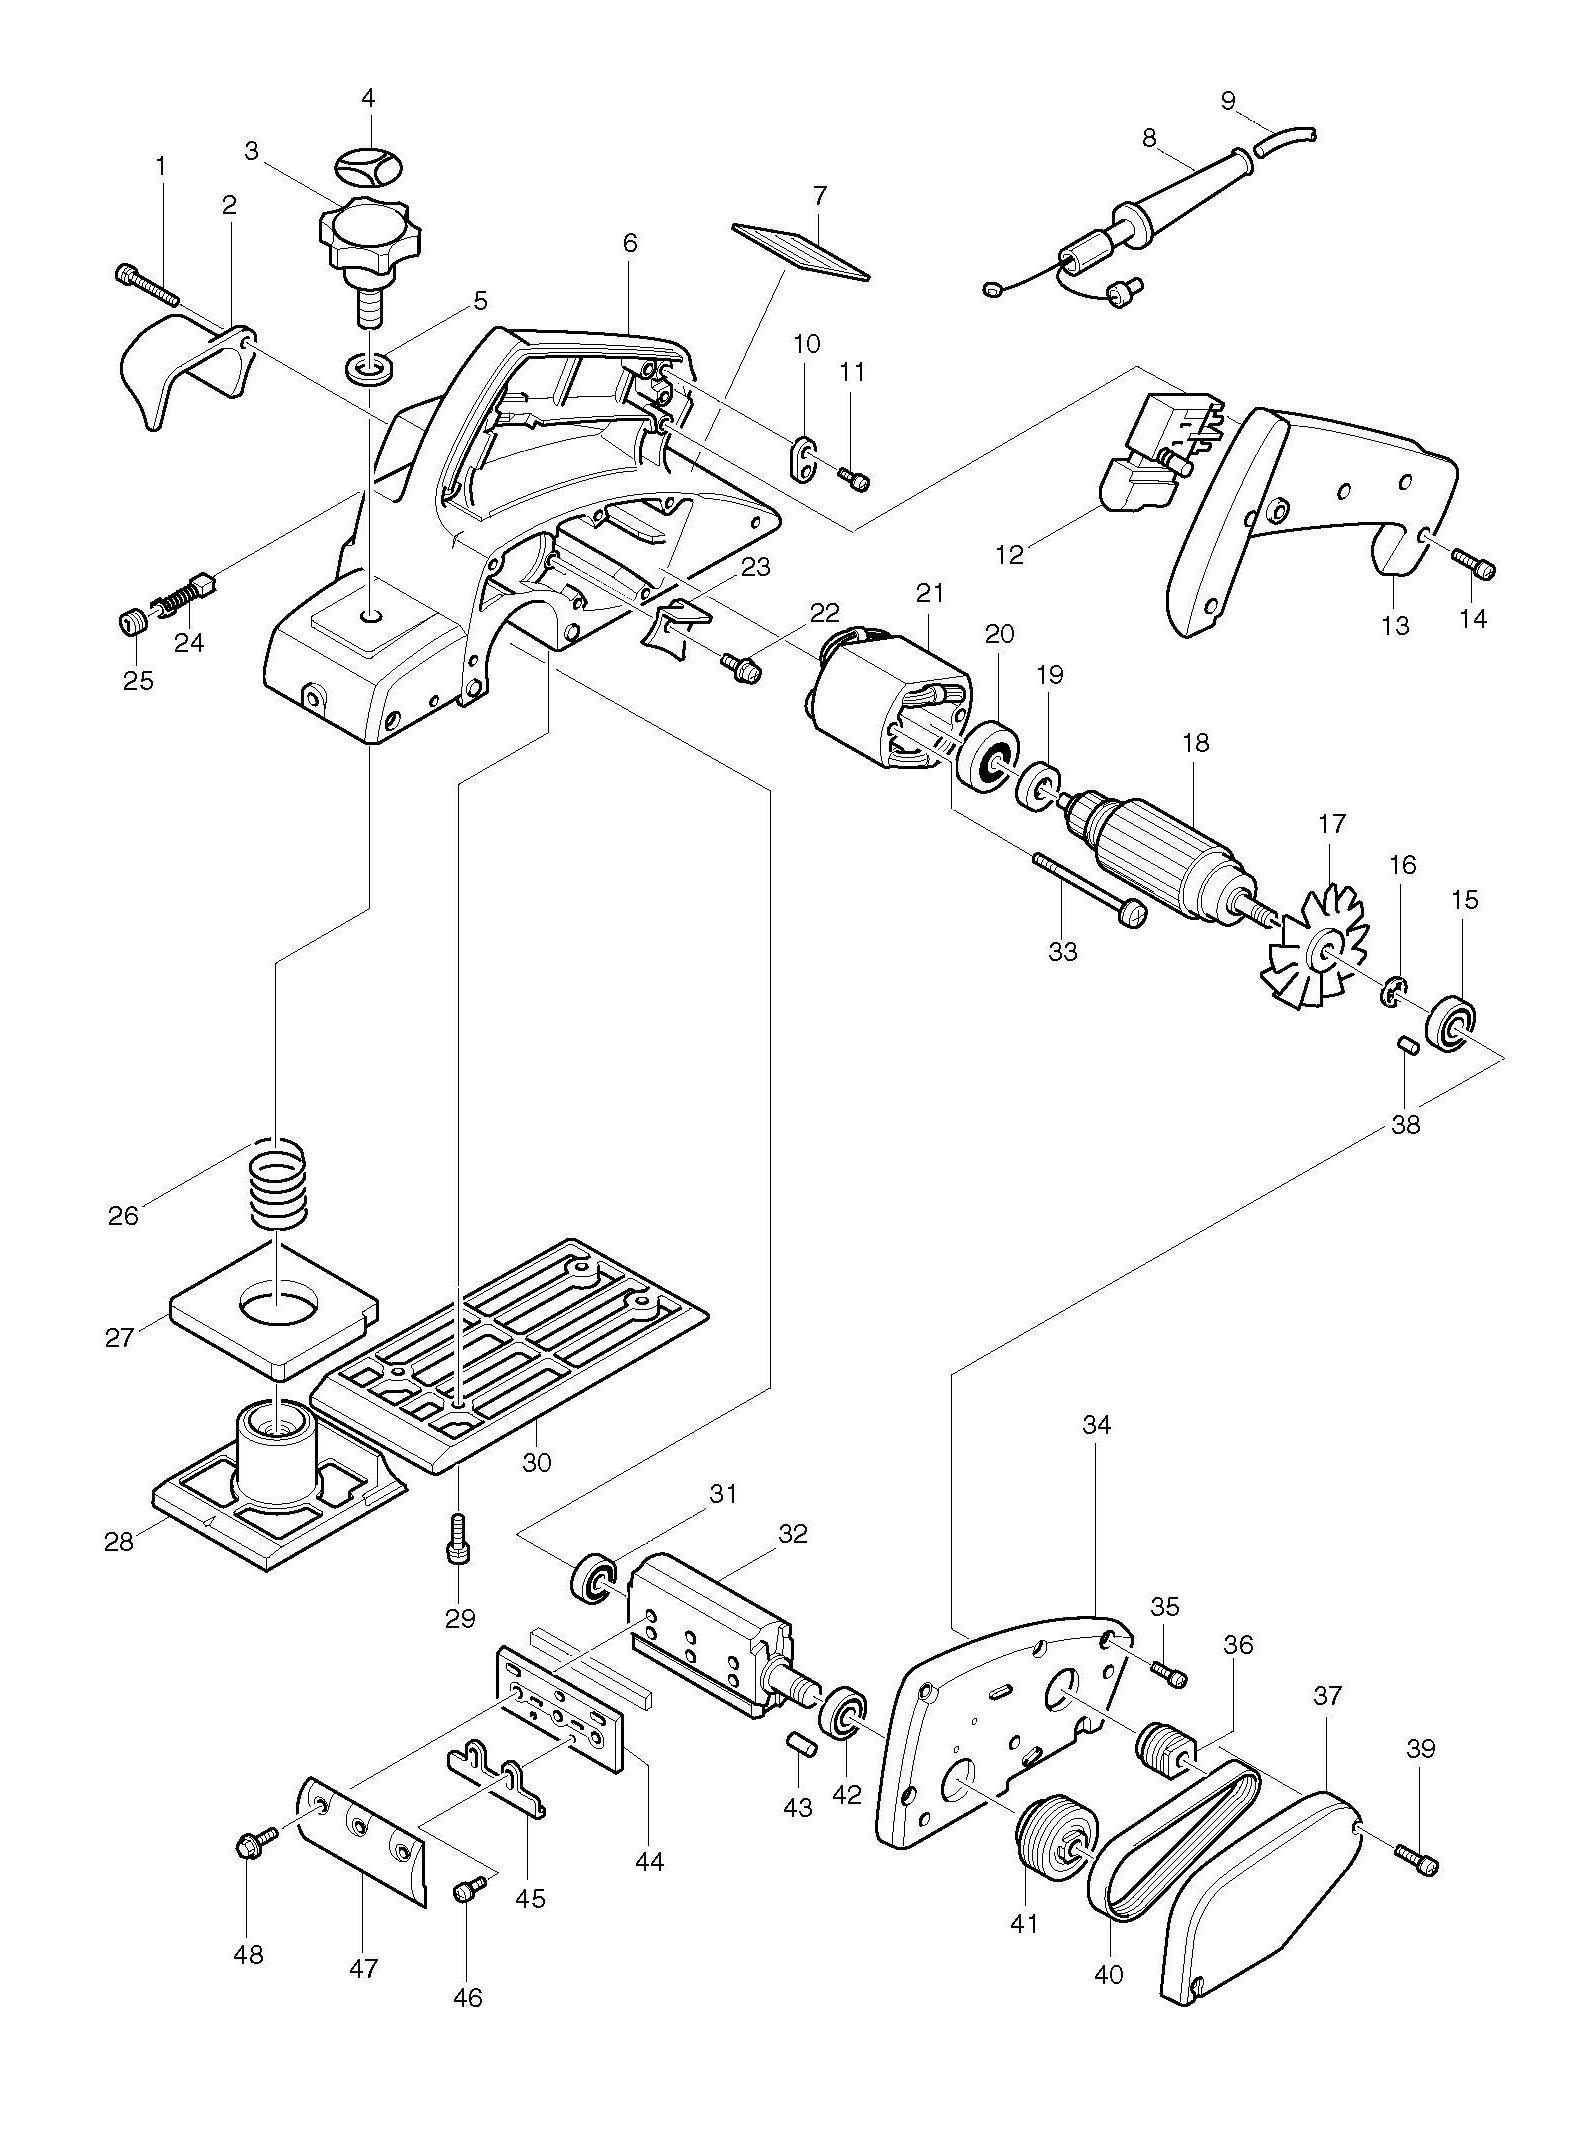 Spares For Makita 1902 110v 240v Corded Planer Spare Parts